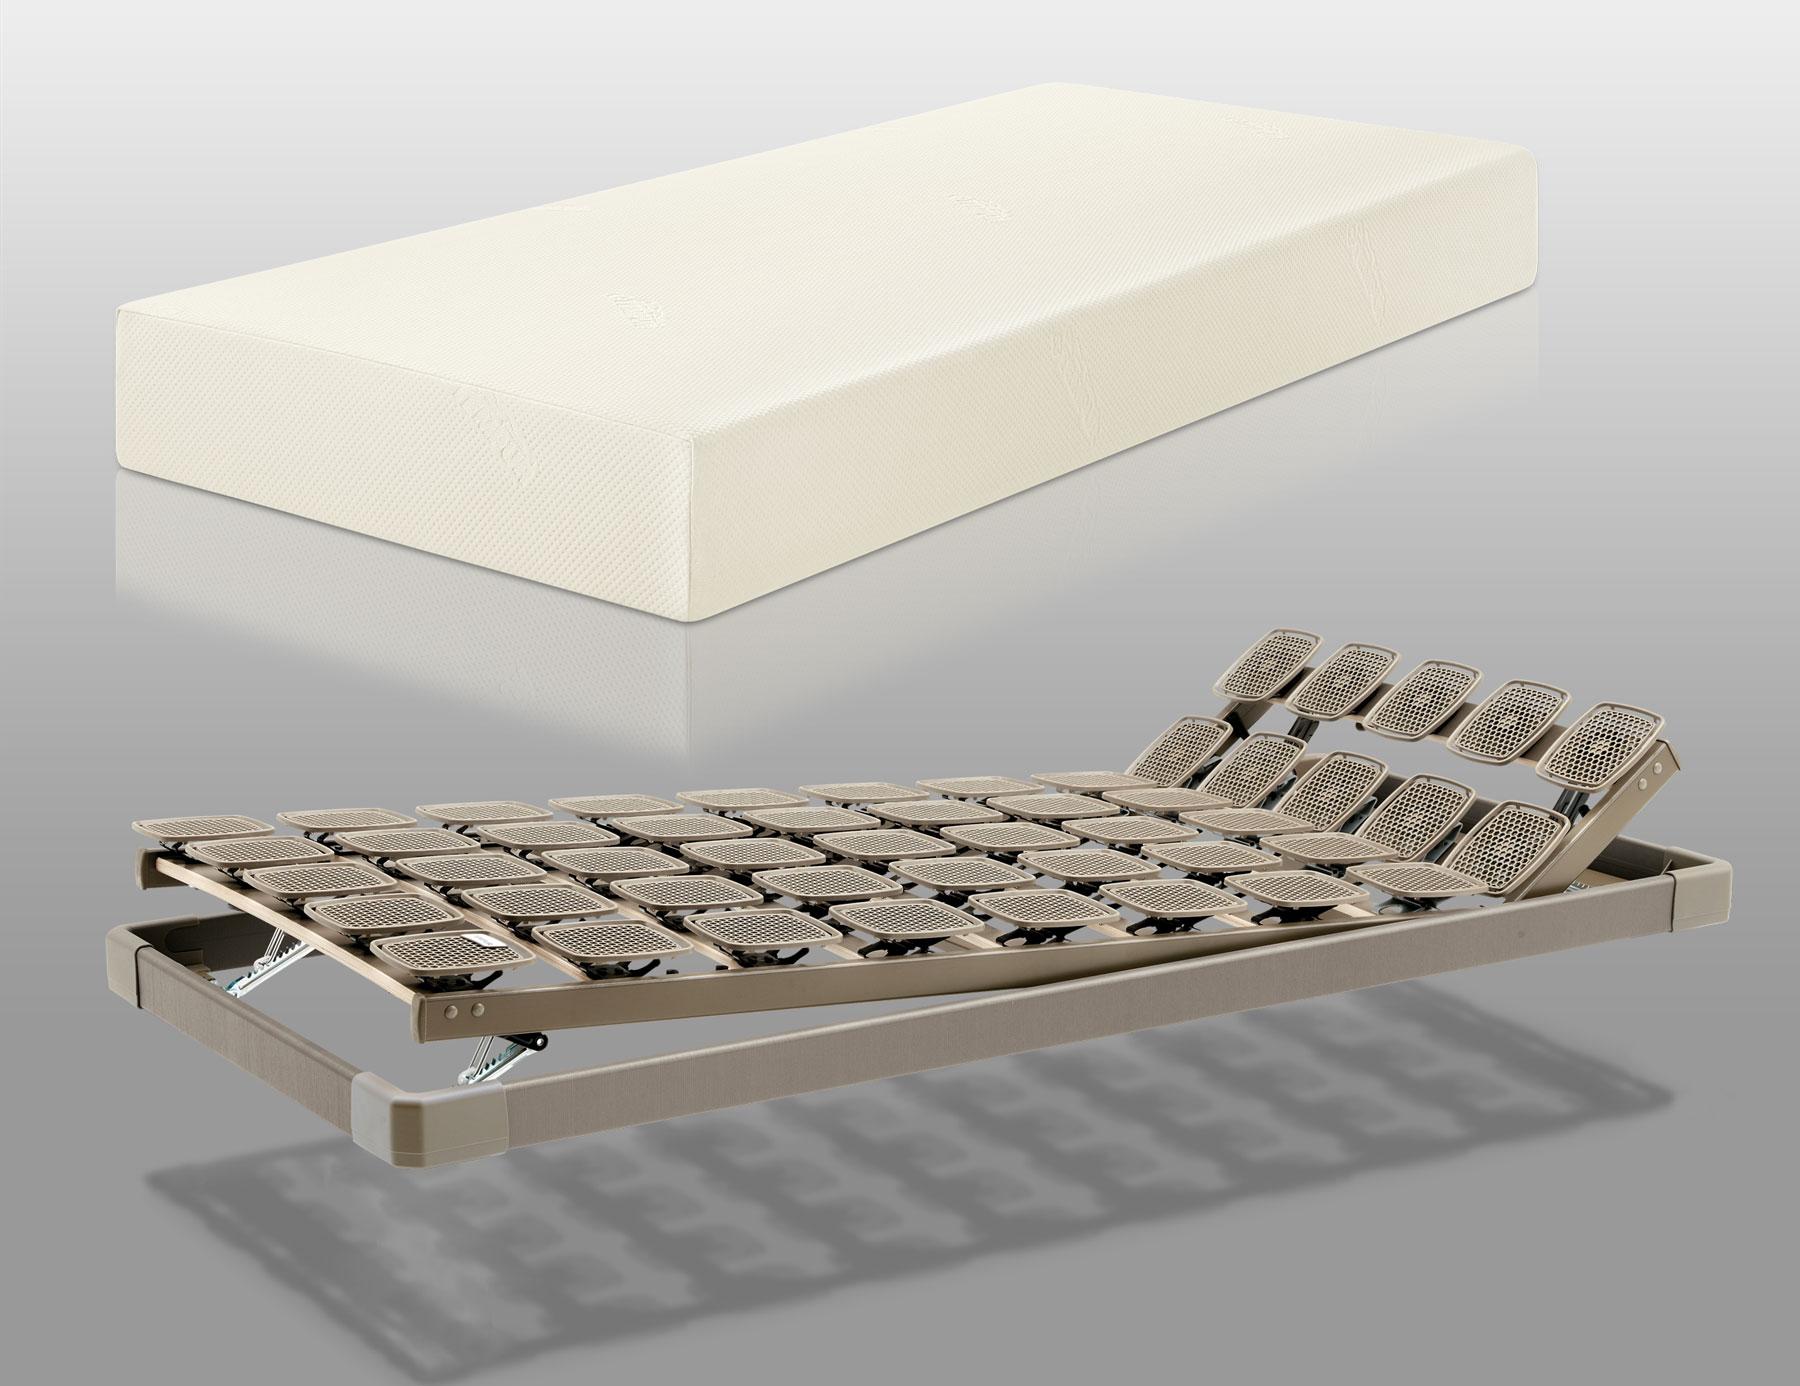 TEMPUR Original 20 Matratze mit Flex 1000 ER Tellerrahmen | Schlafzimmer > Matratzen > Matratzen-Sets | Tempur